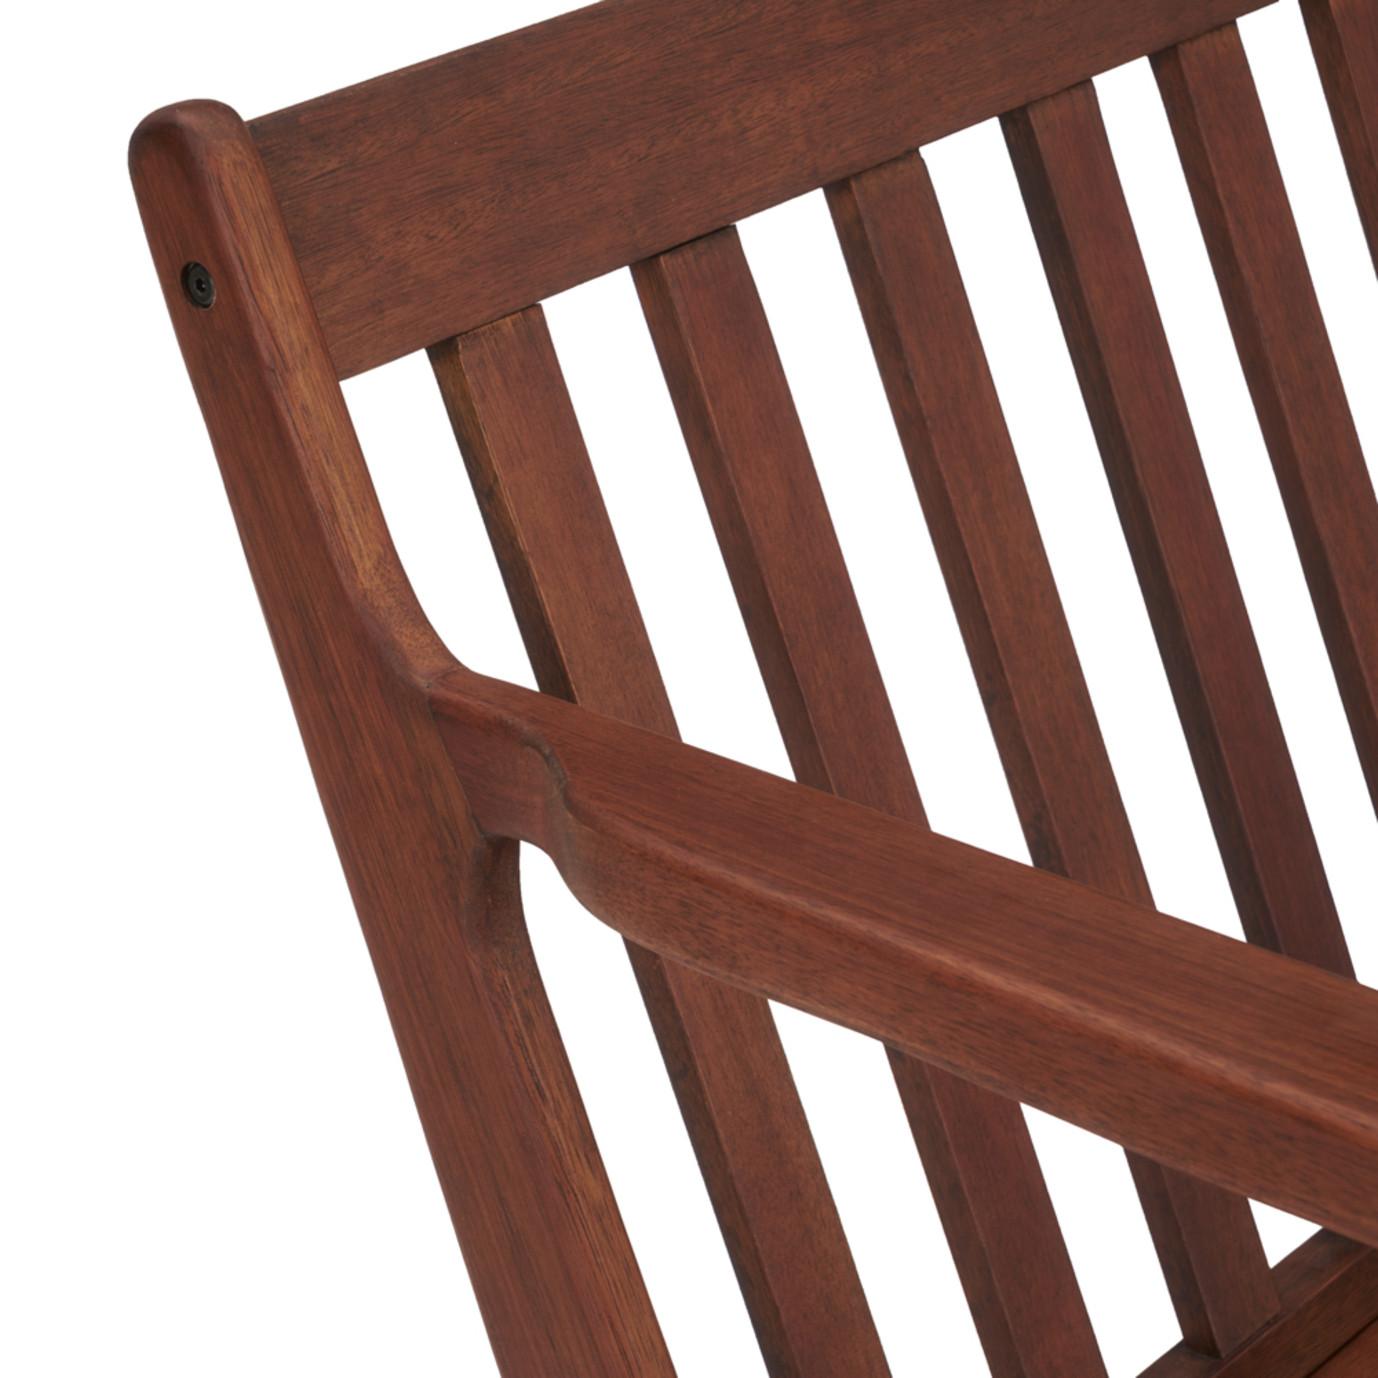 Vaughn 5pc Seating Set - Charcoal Gray